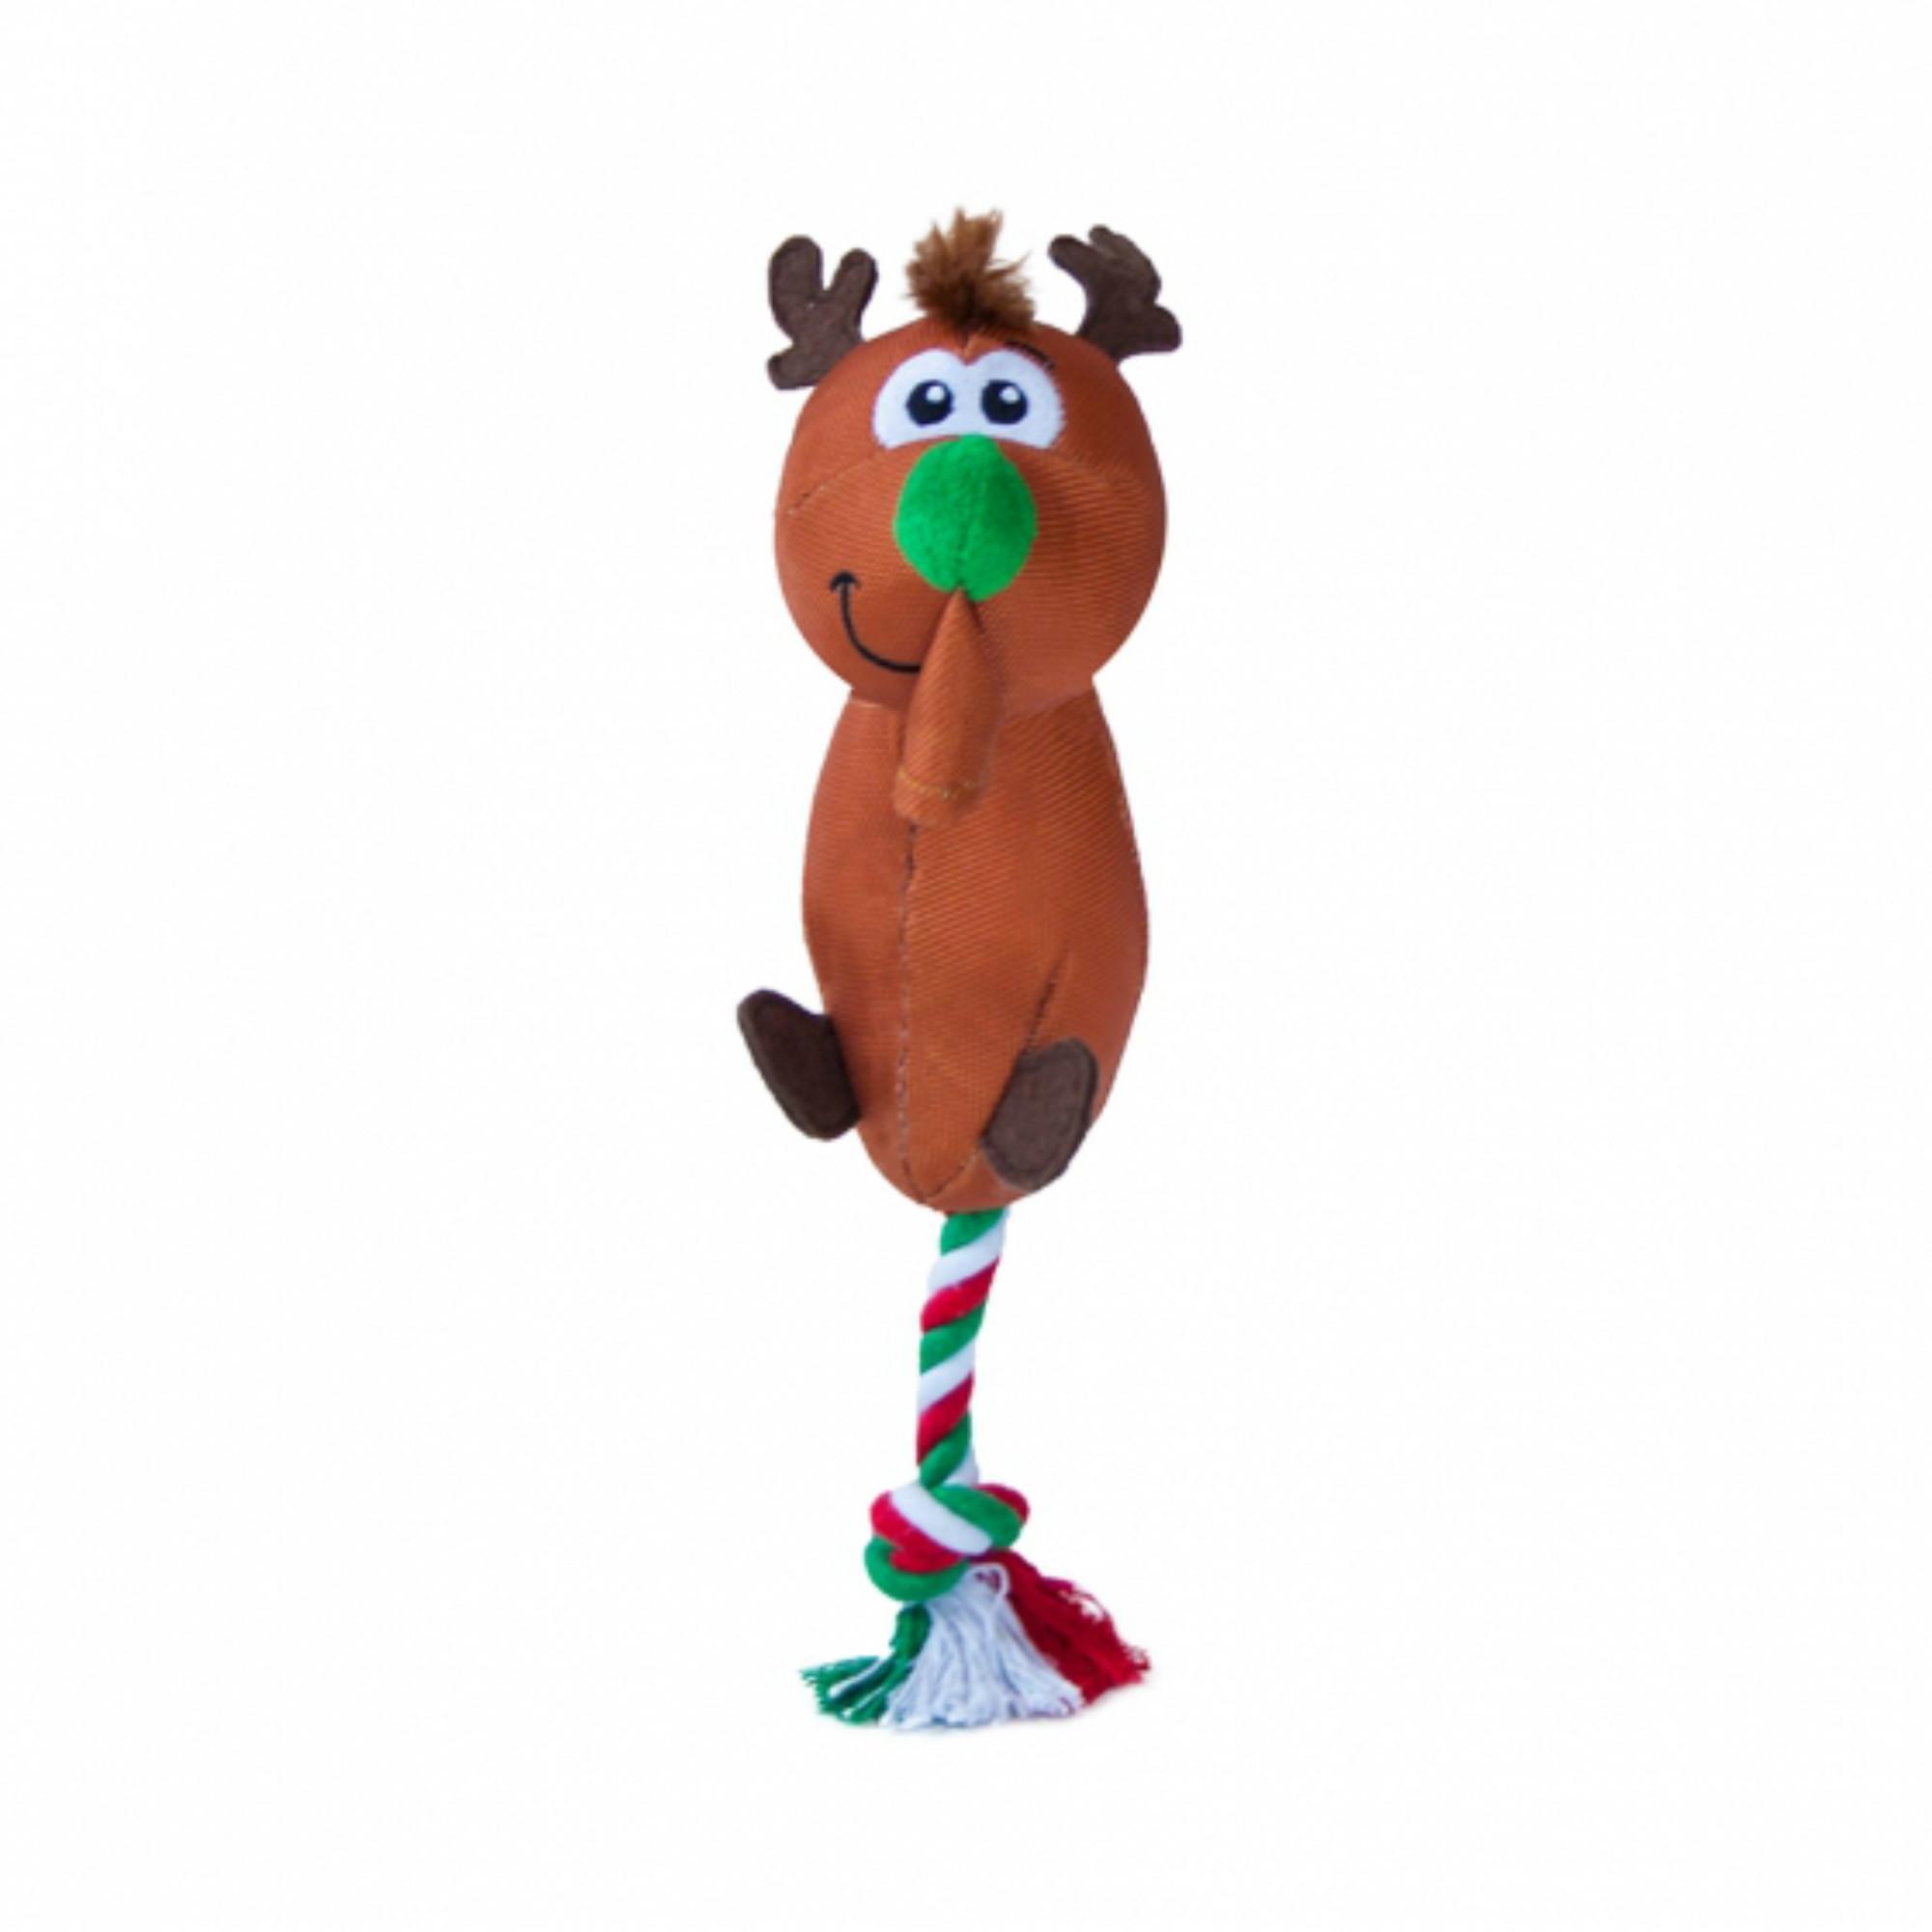 Outward Hound Holiday Flingerz - Reindeer